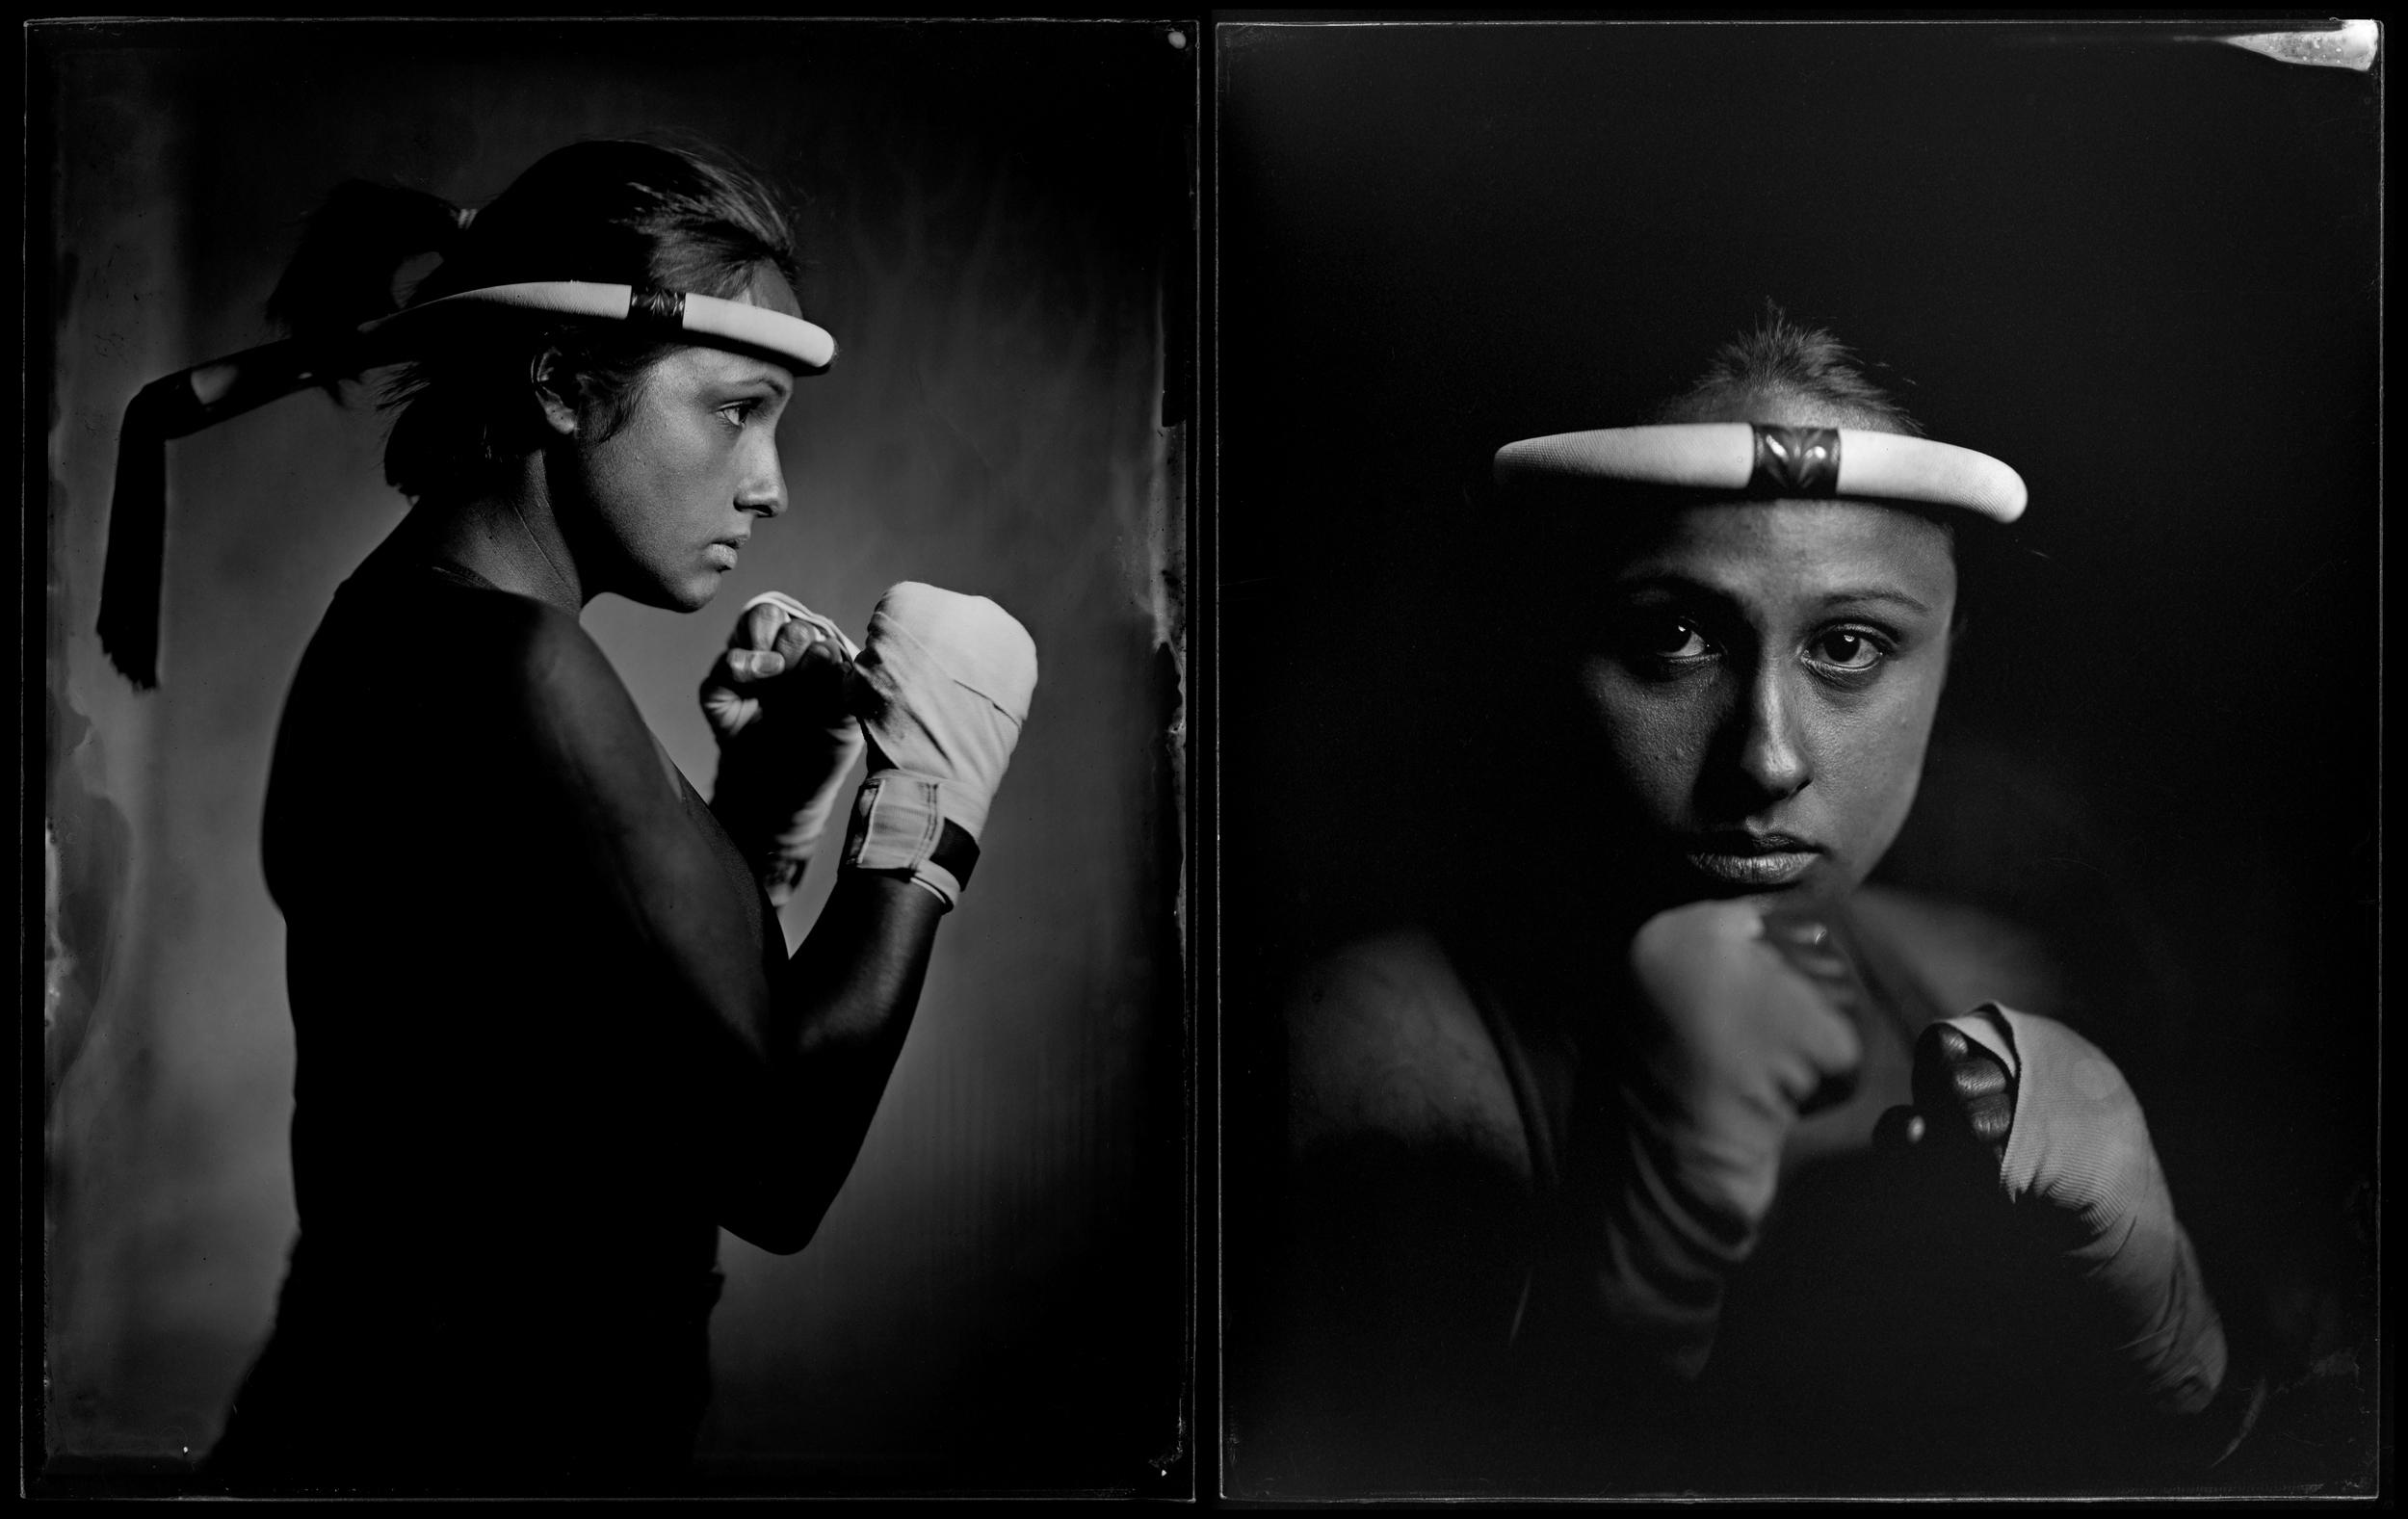 "Kirstina Sangsahachart, Muay Thai fighter - 4"" x 5"" ambrotypes"